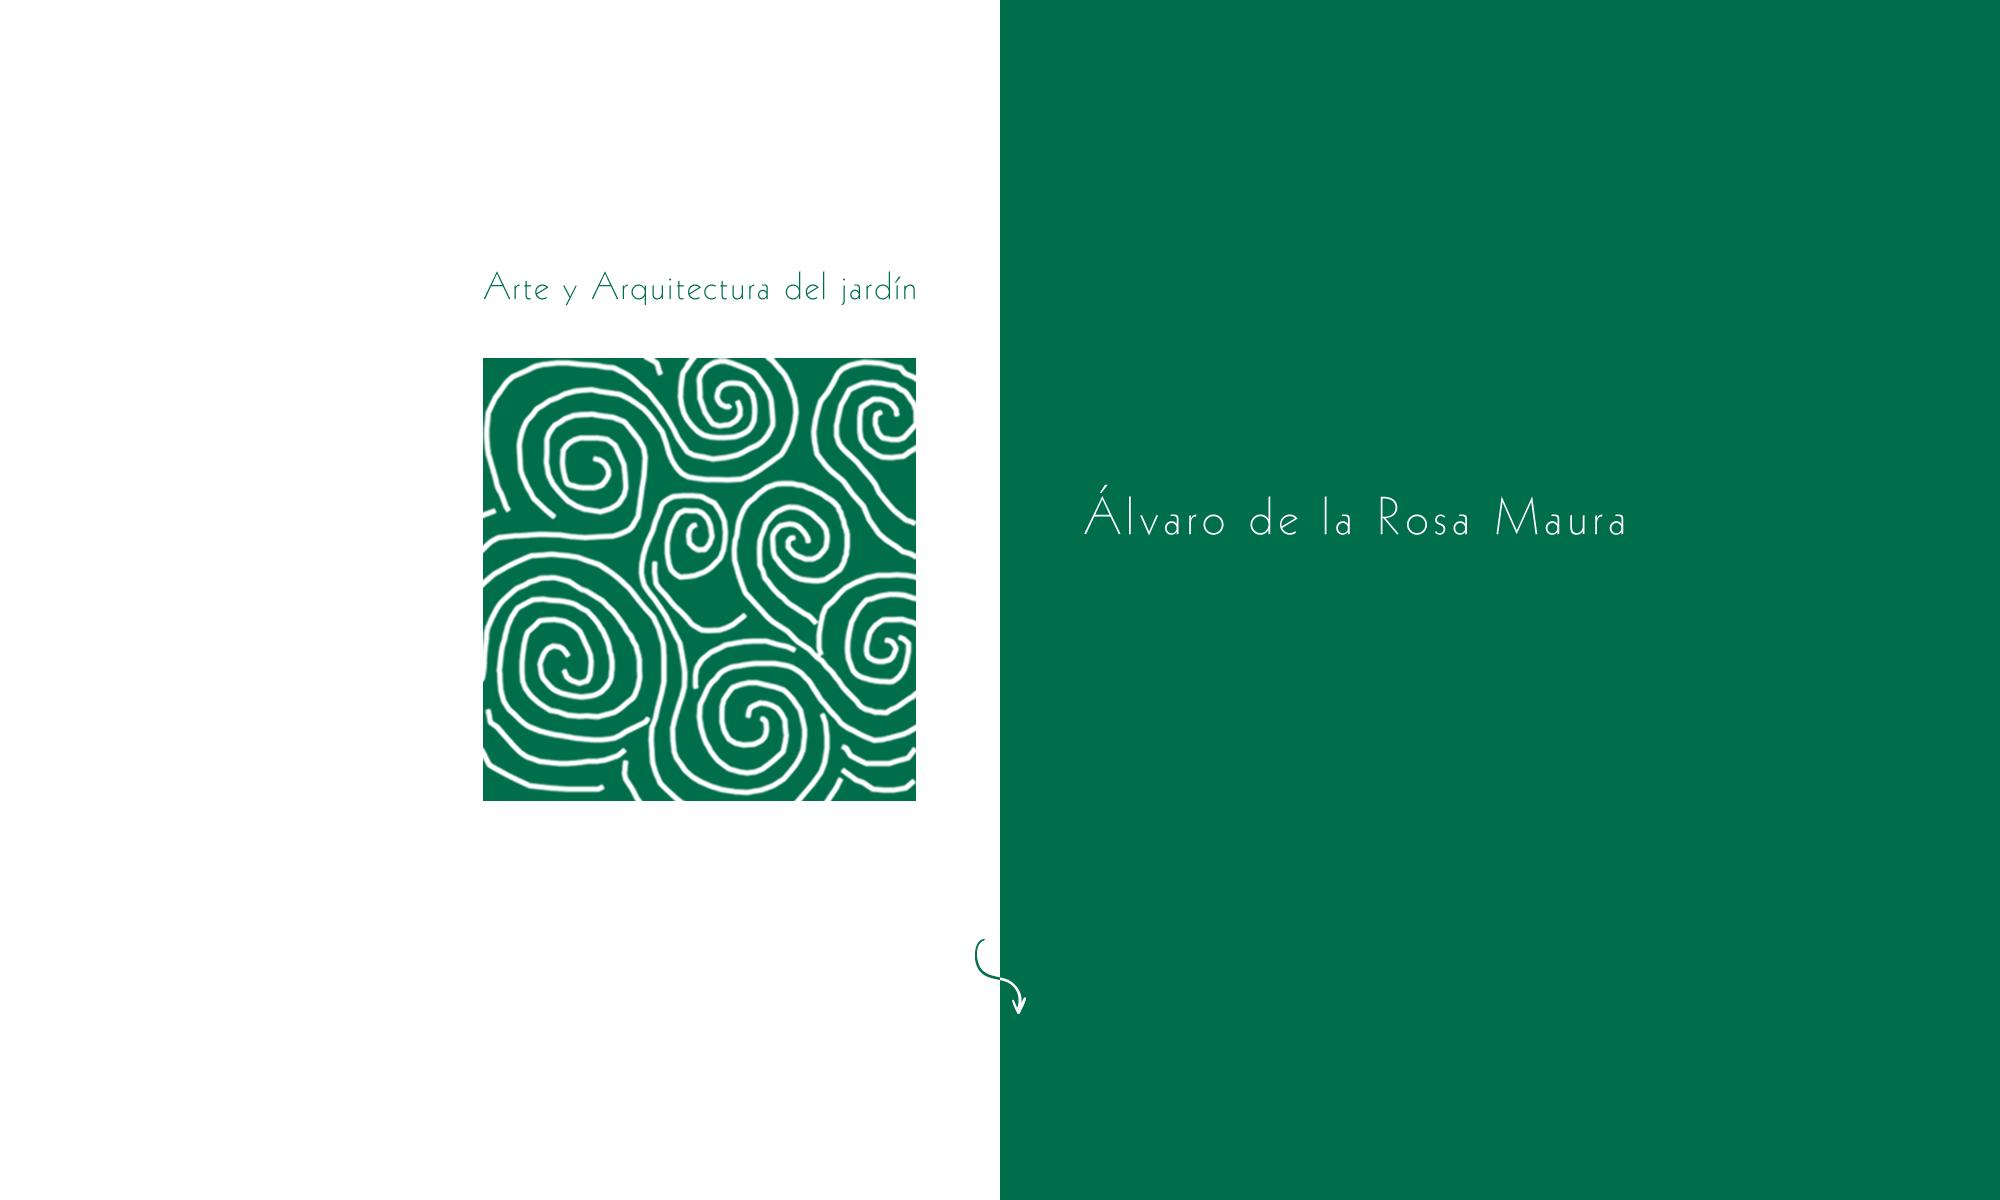 La Rosa Maura - Álvaro de la Rosa Maura